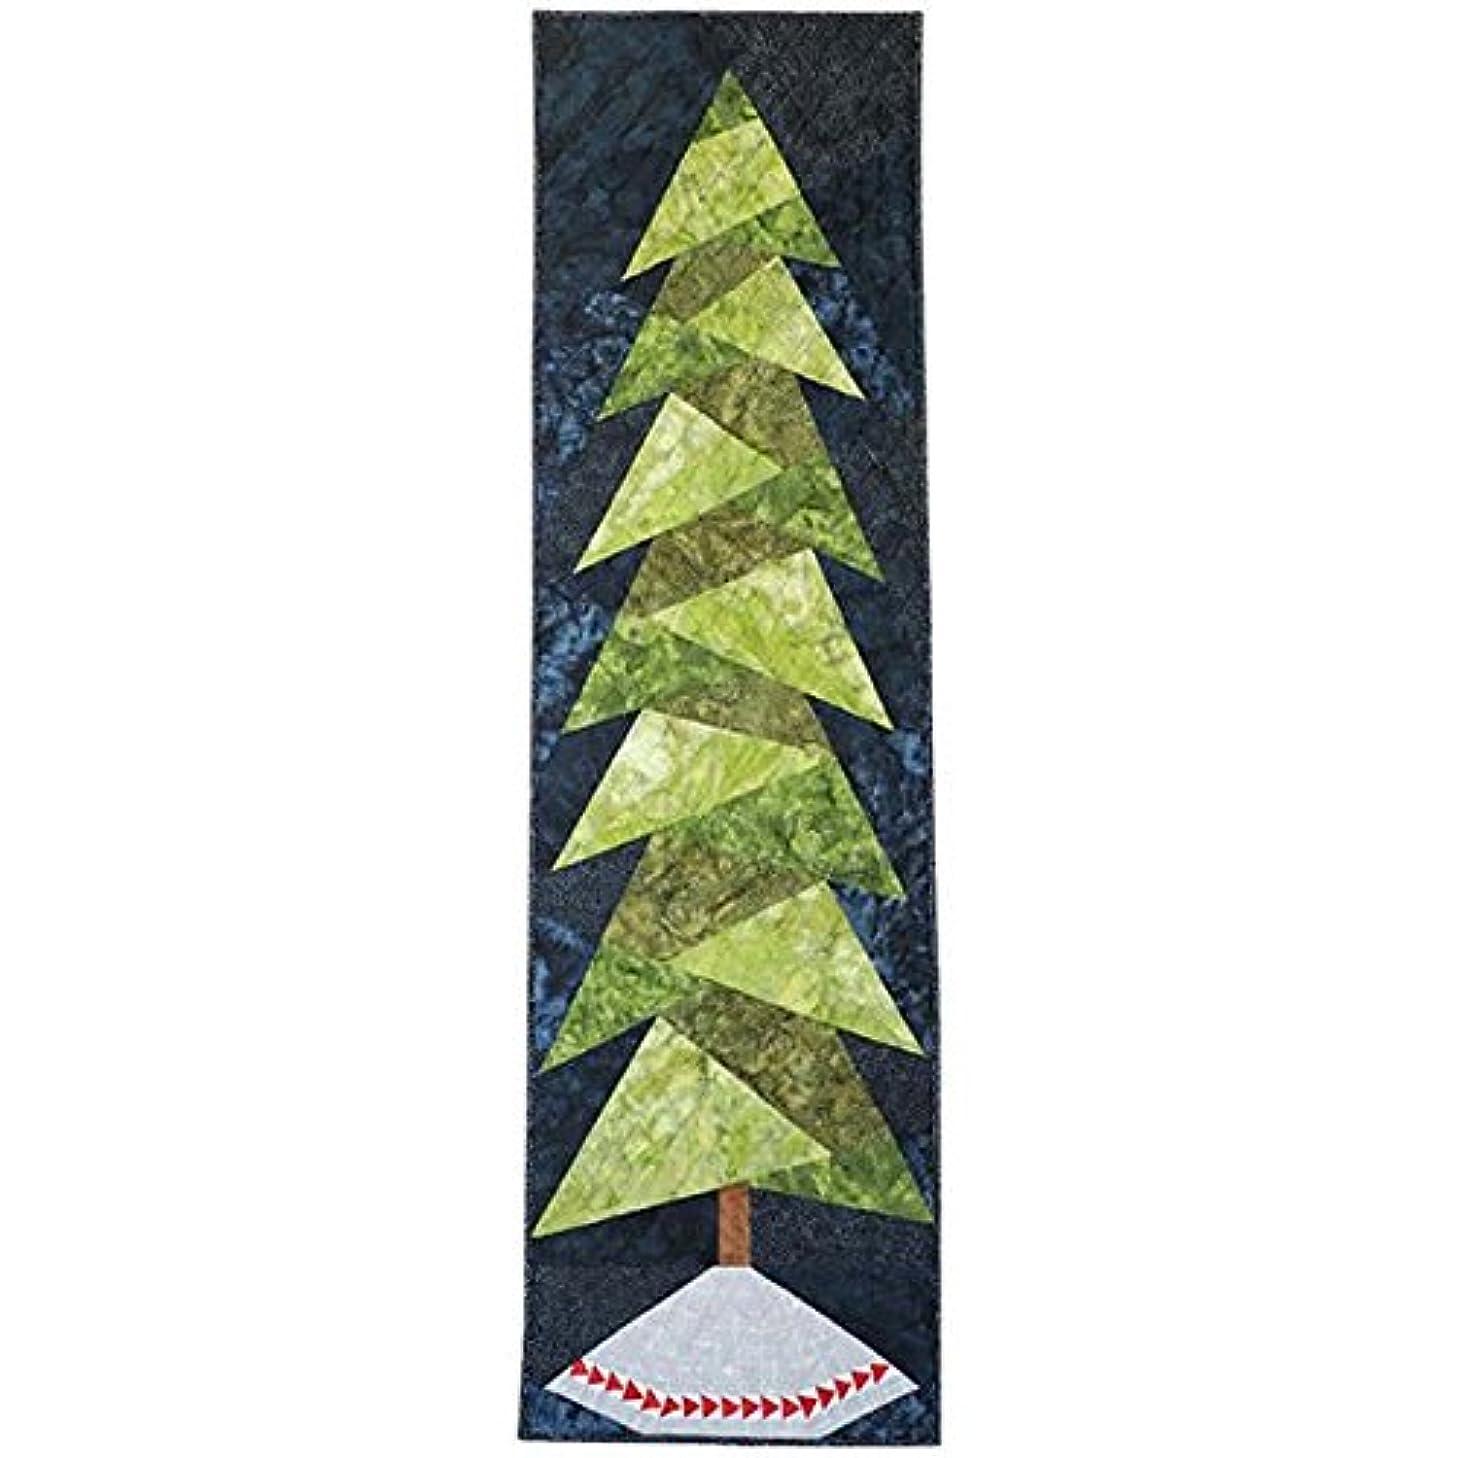 Me + You Indah Batiks & Solids Tree Hugger Midnight Quilt Kit Hoffman Fabrics CEKIT-128-MIDNIGHT